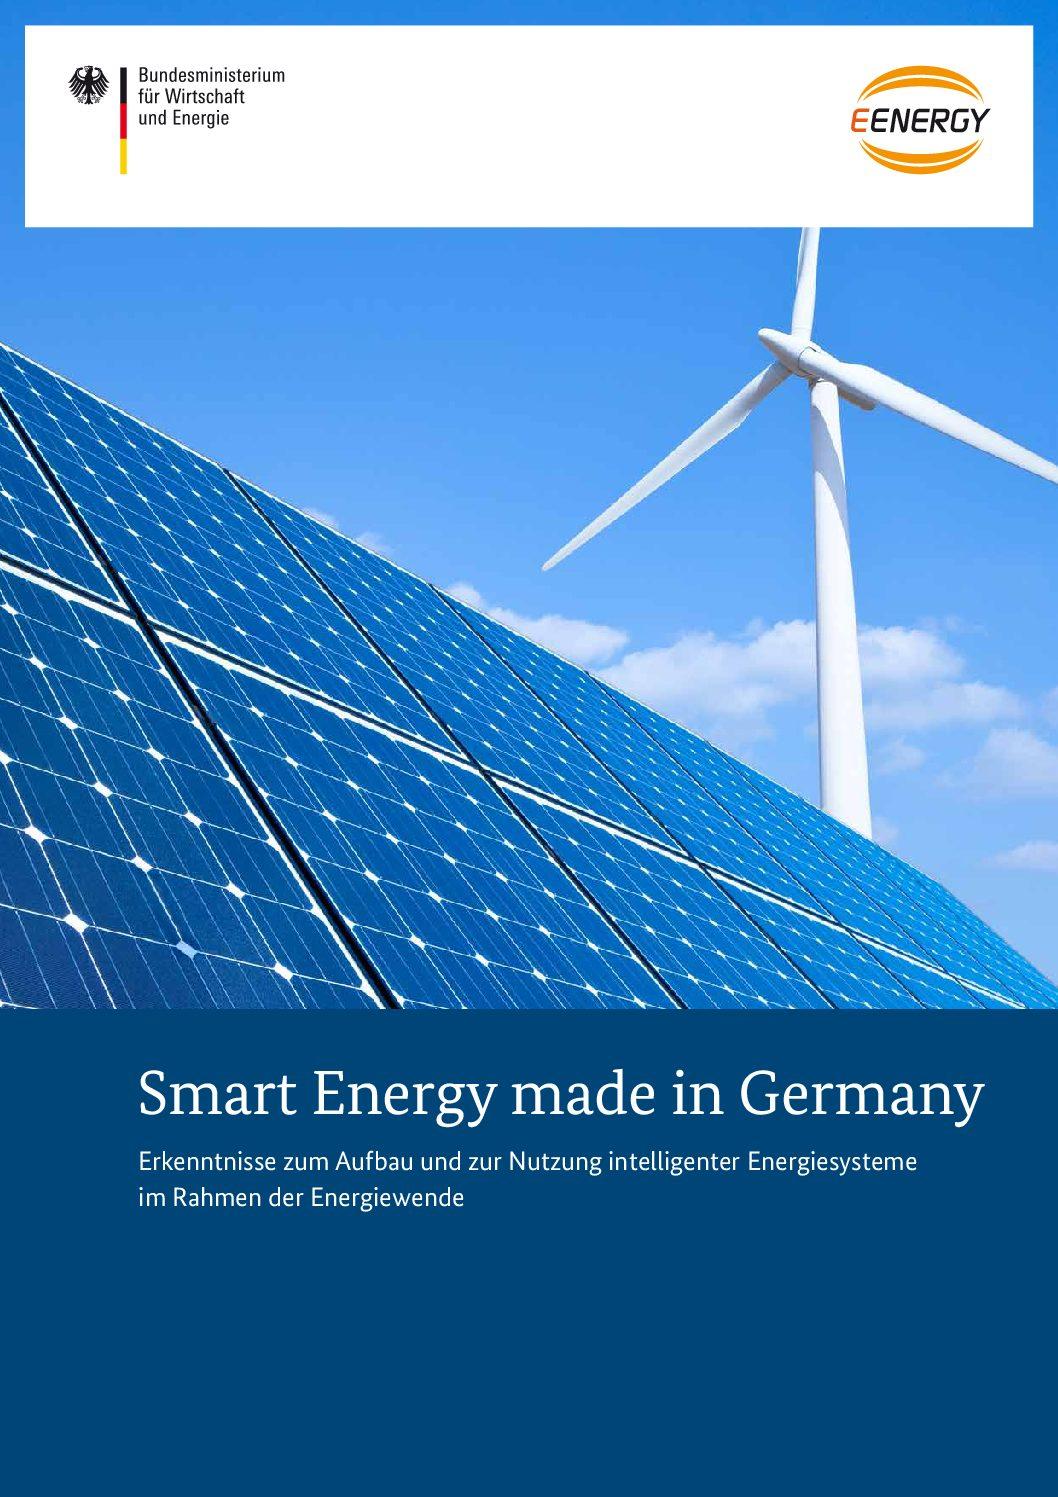 Smart Energy made in Germany E-Energy Abschlussbericht